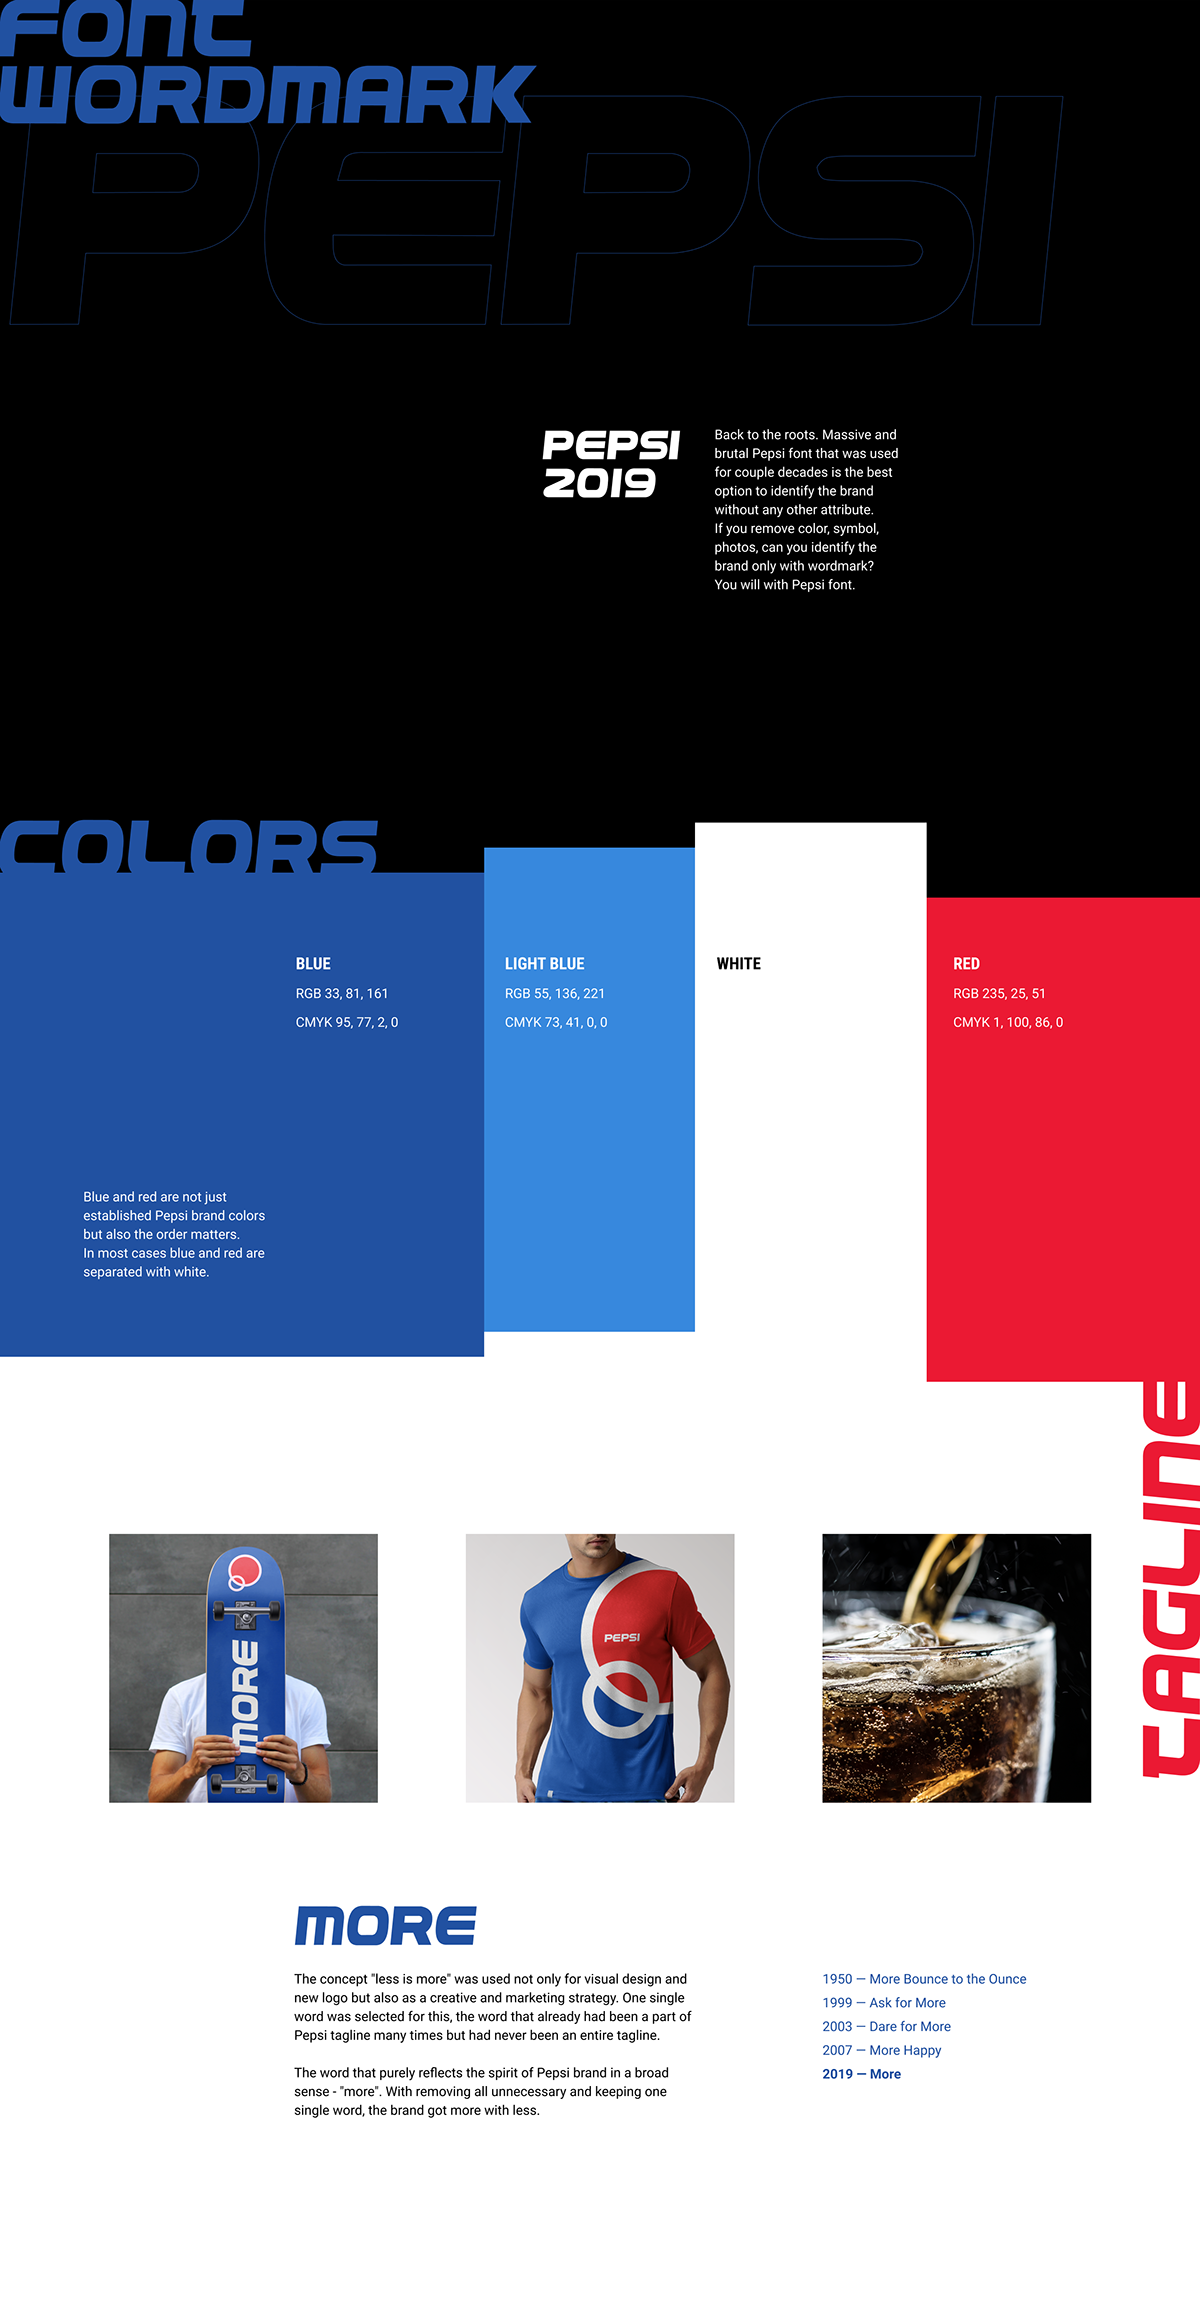 Pepsi Logo Identity and UI/UX Design Concept on Pantone